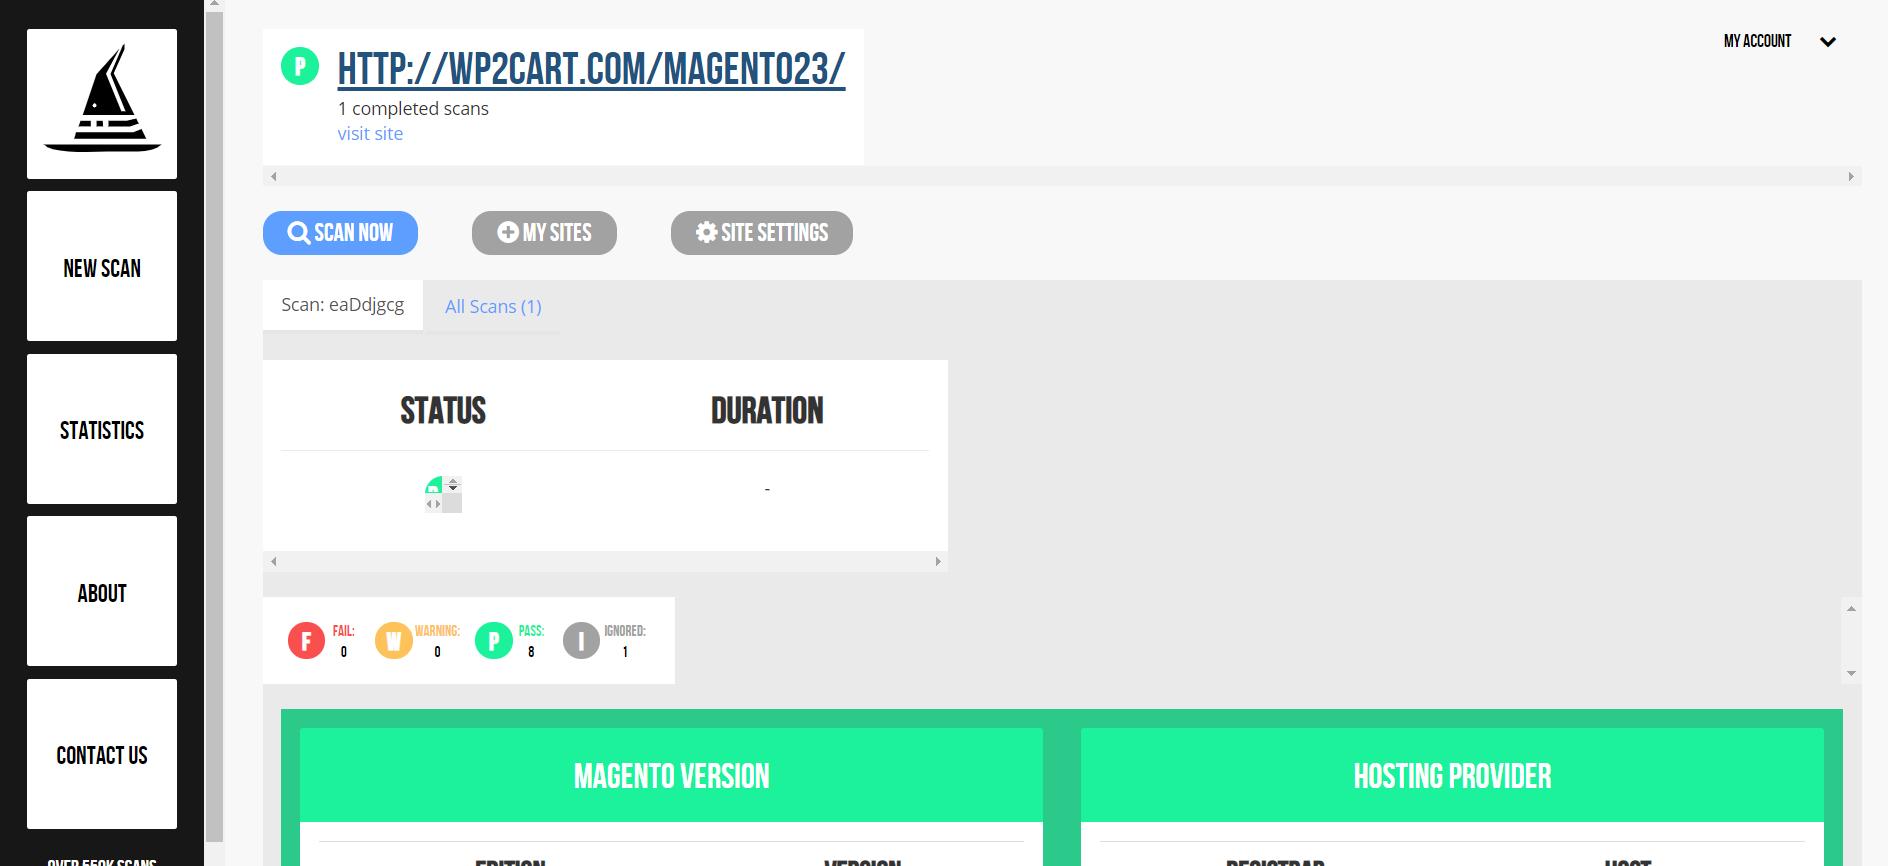 Magento 2 version